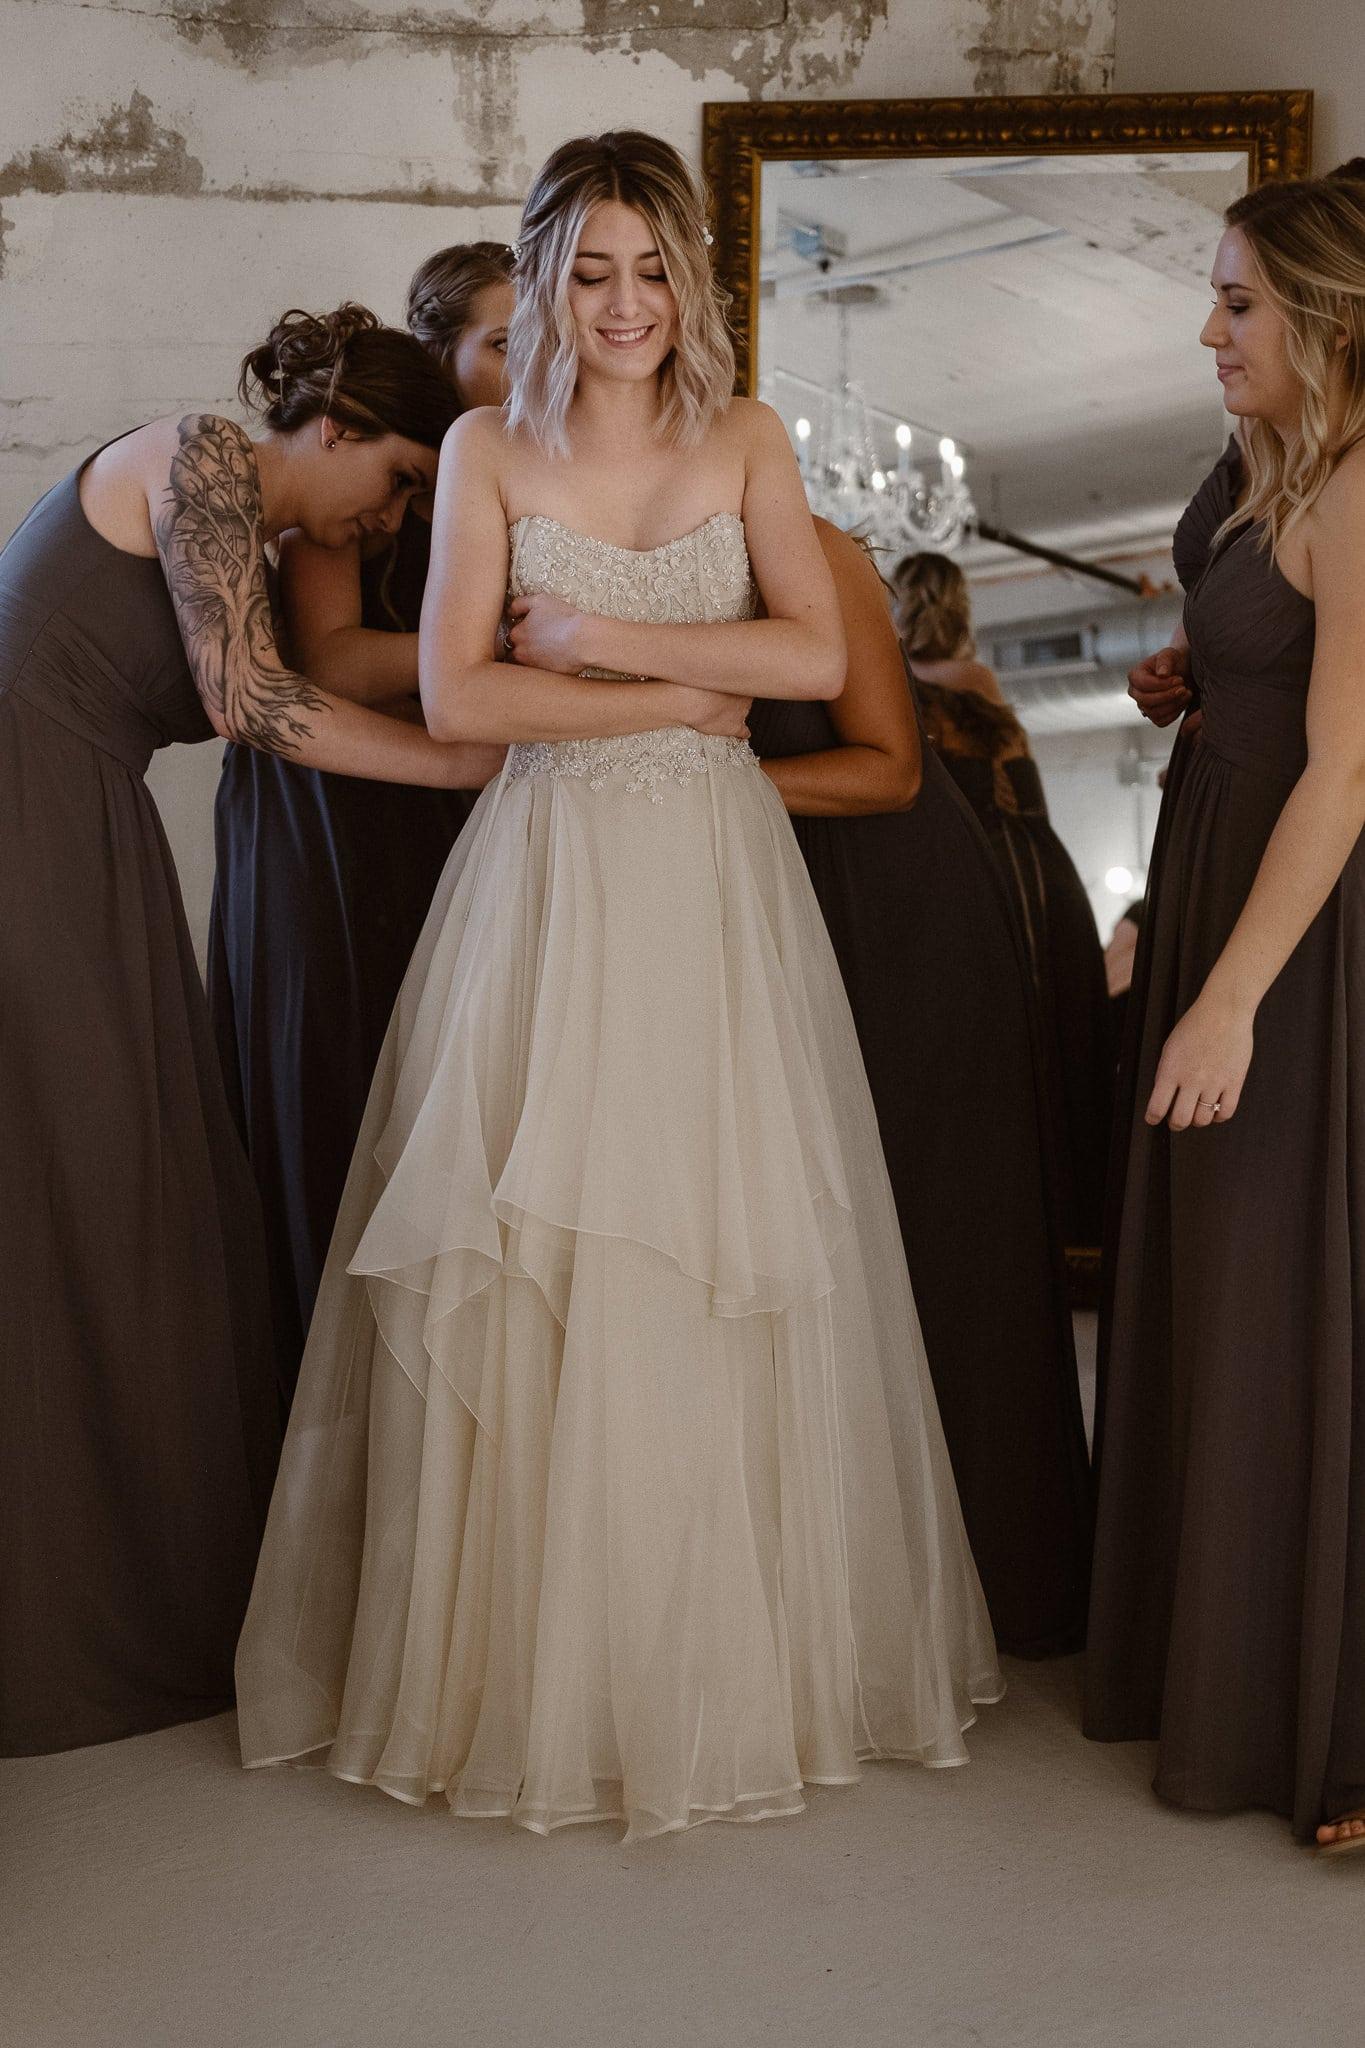 St Vrain Wedding Photographer | Longmont Wedding Photographer | Colorado Winter Wedding Photographer, Colorado industrial chic wedding, bride getting ready